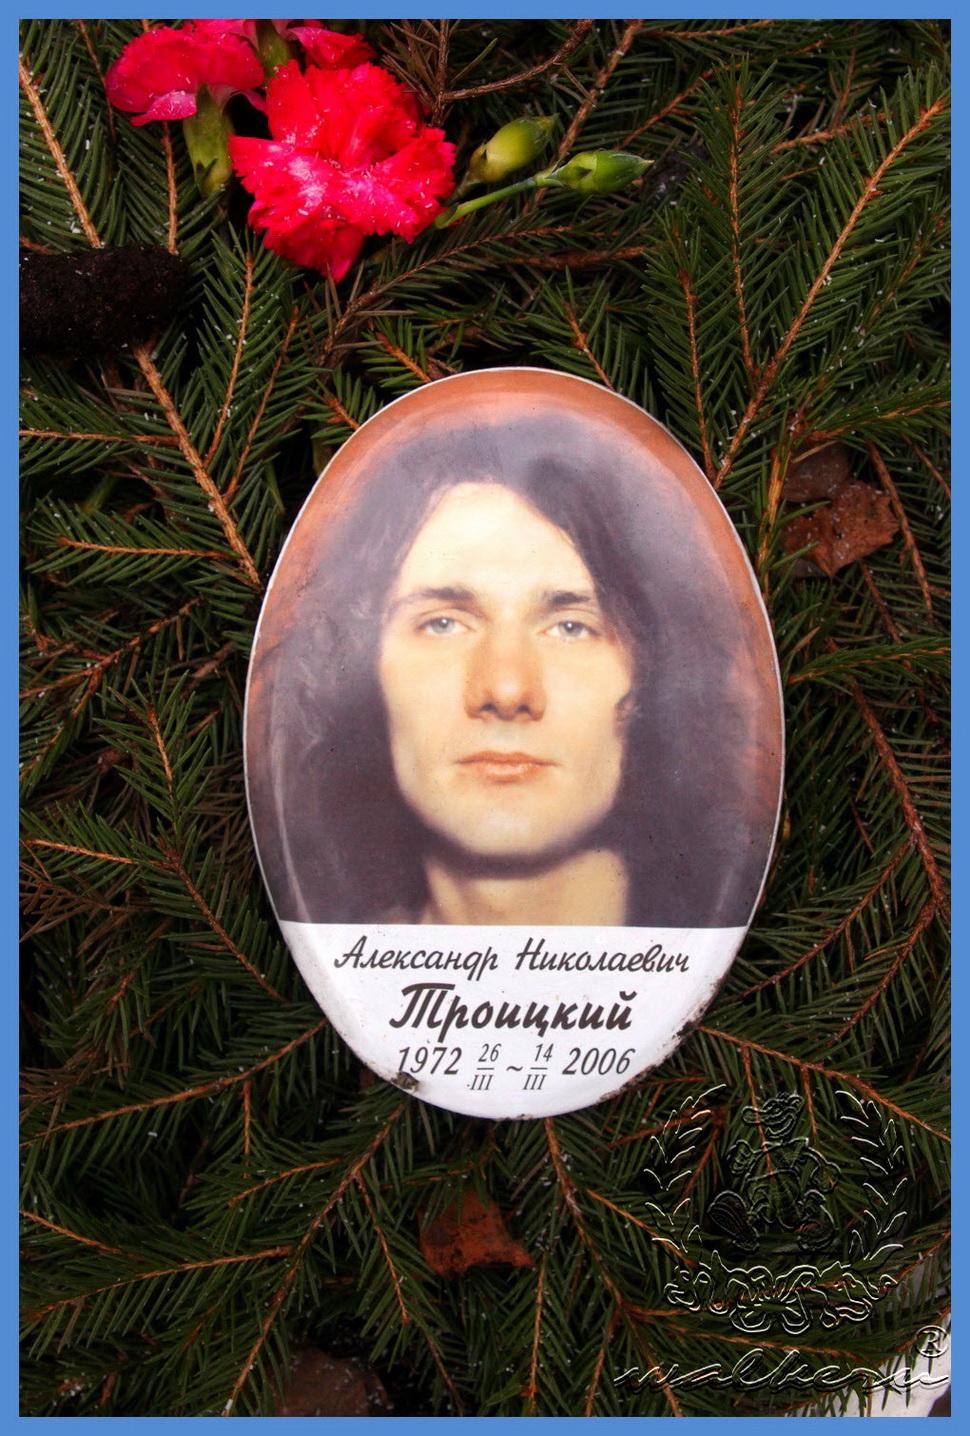 Троицкий Александр Николаевич